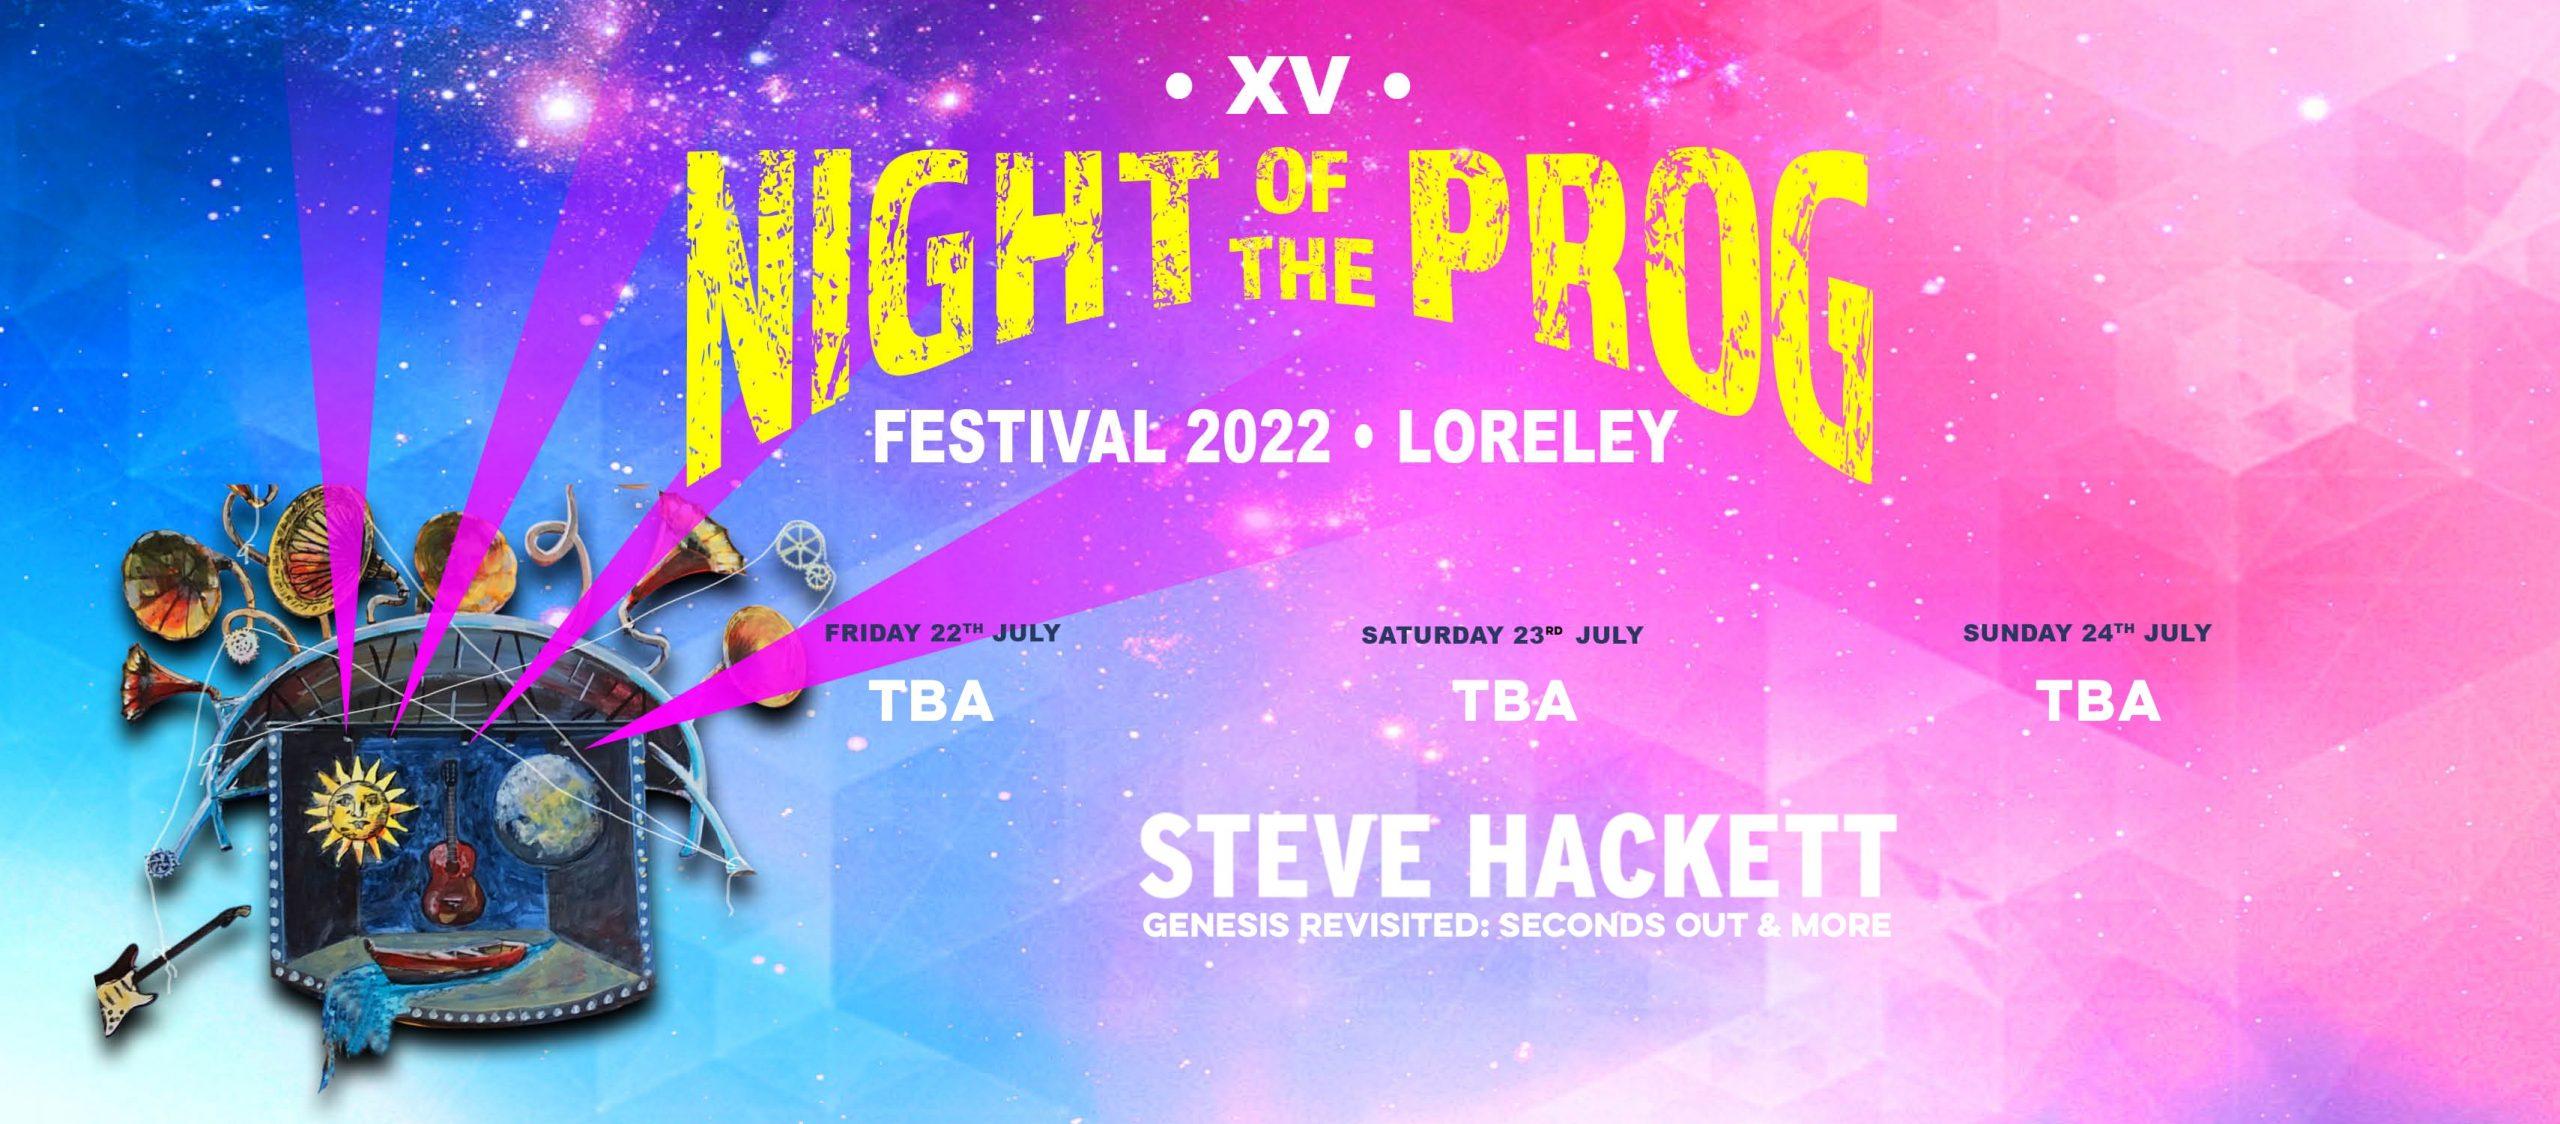 www.nightoftheprogfestival.com